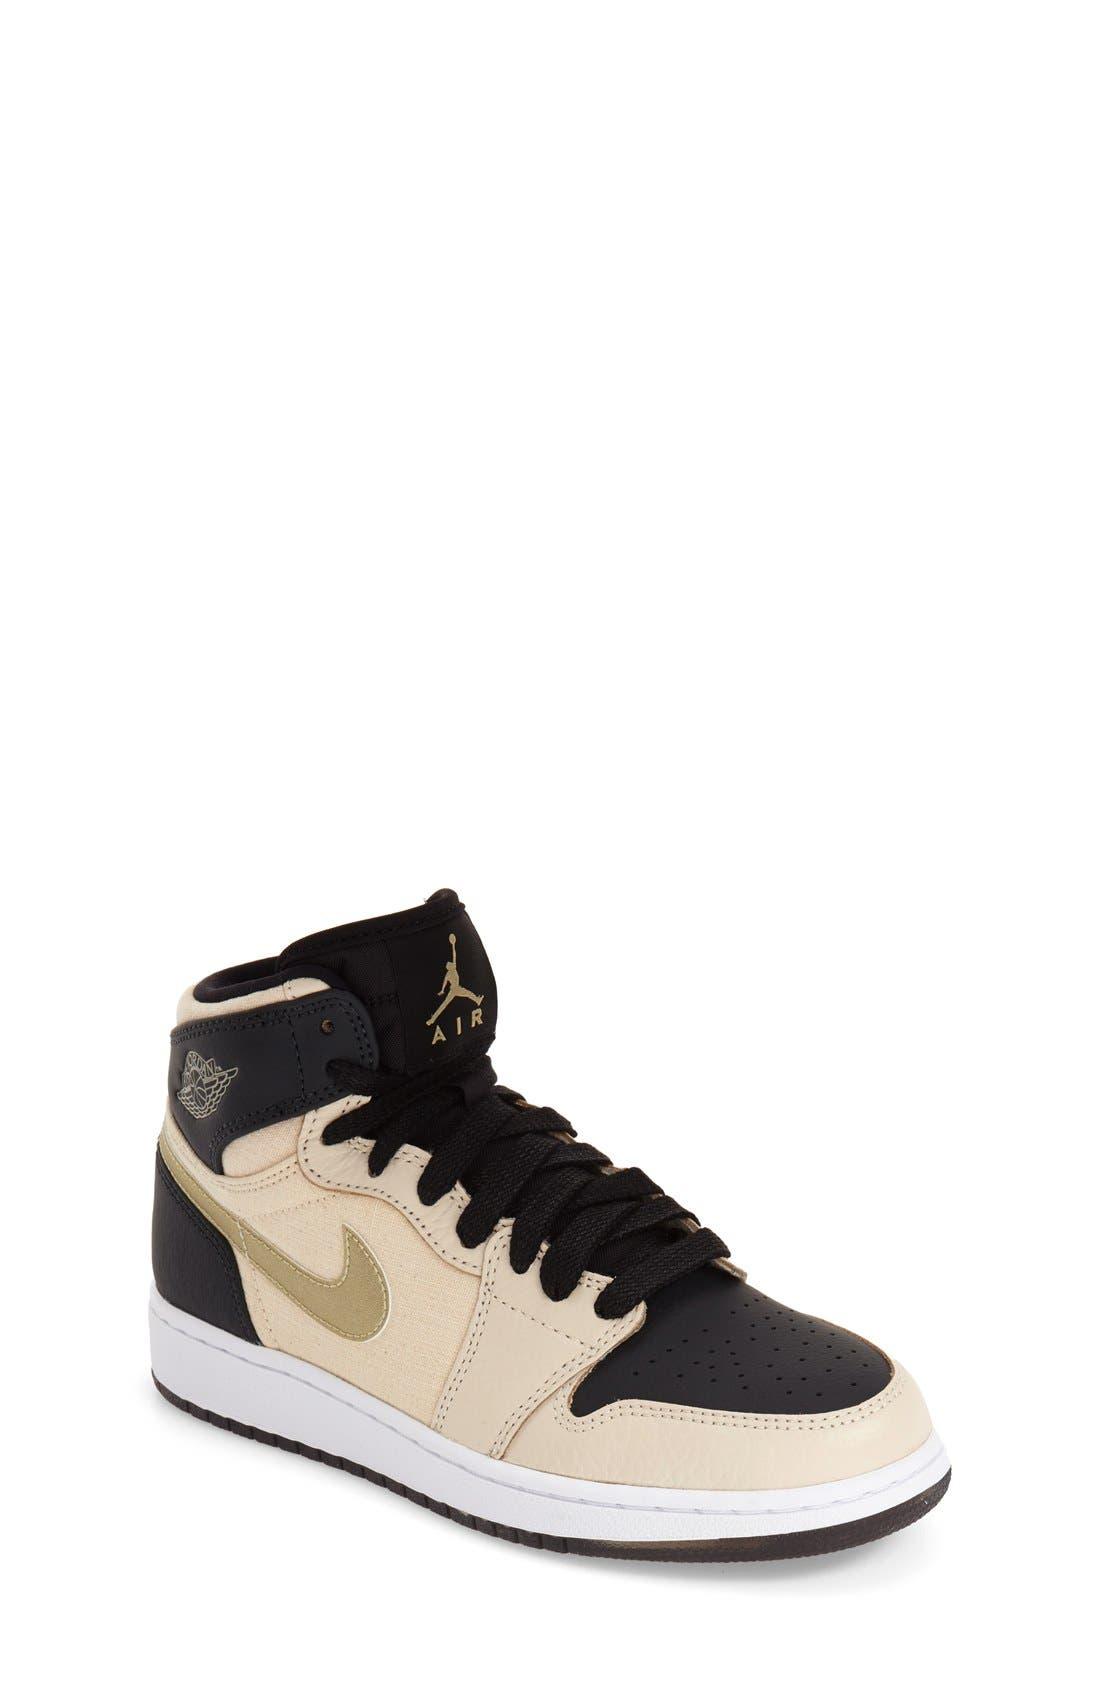 Nike 'Air Jordan 1 Retro' High Top